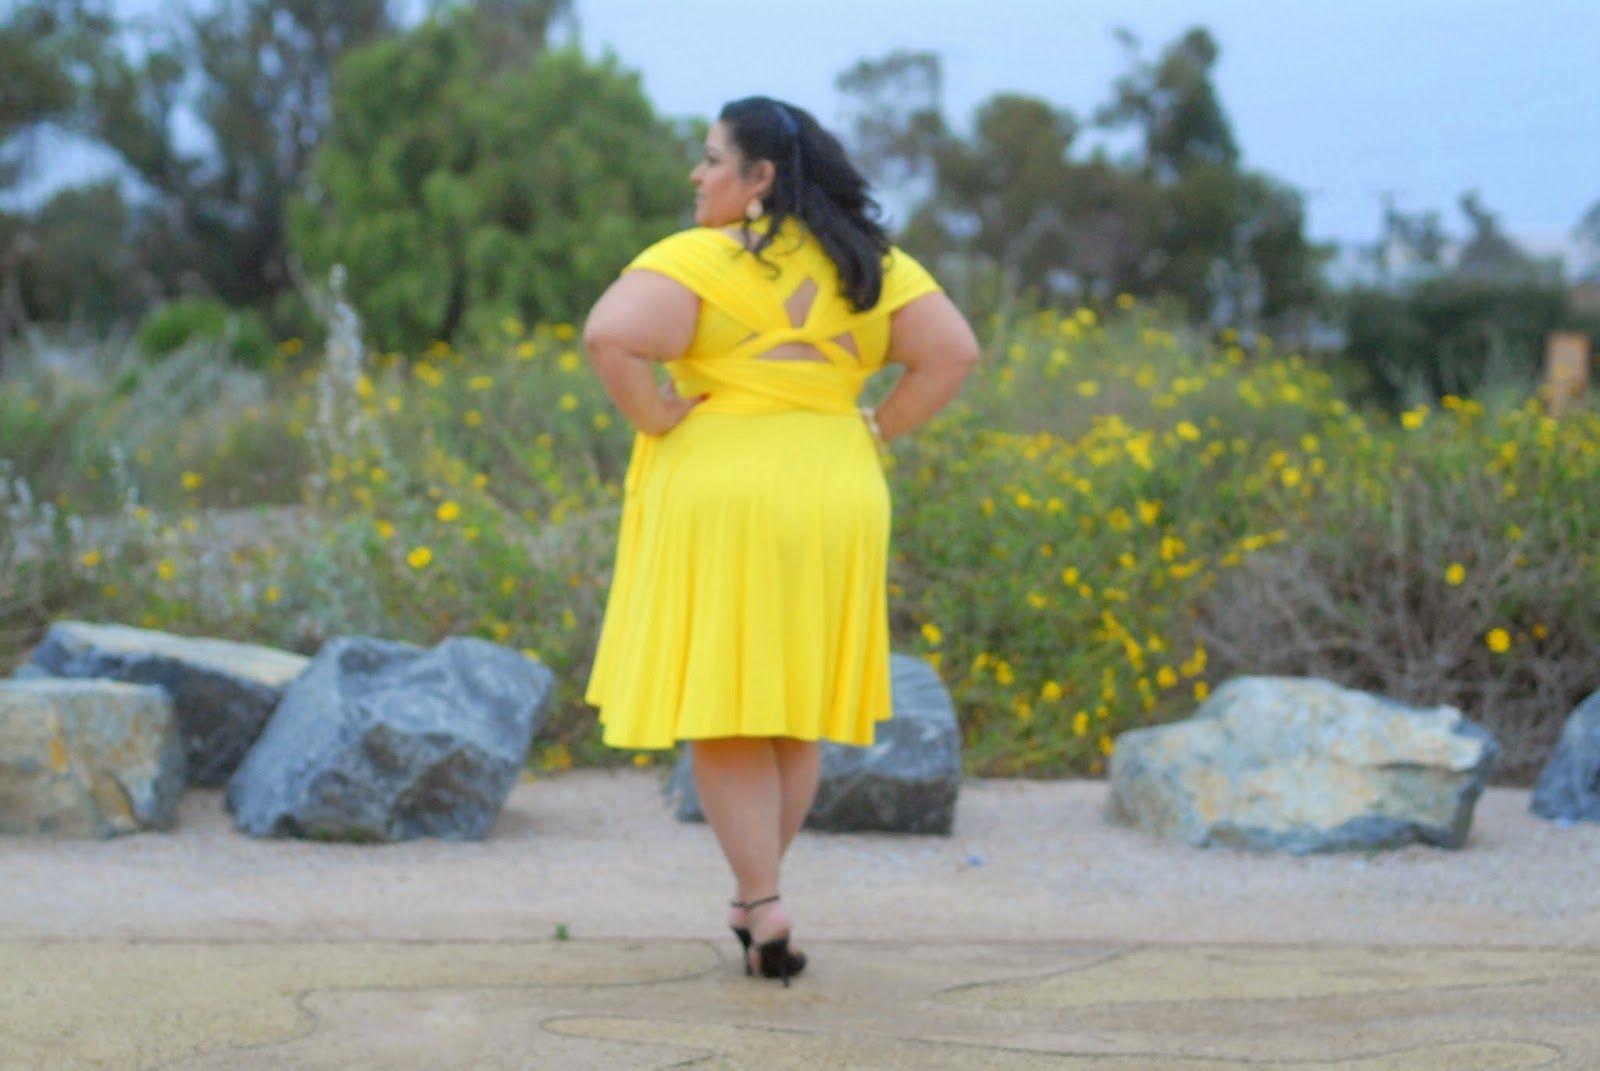 pinbbwgeneration on fatshionistas - plus size style | pinterest